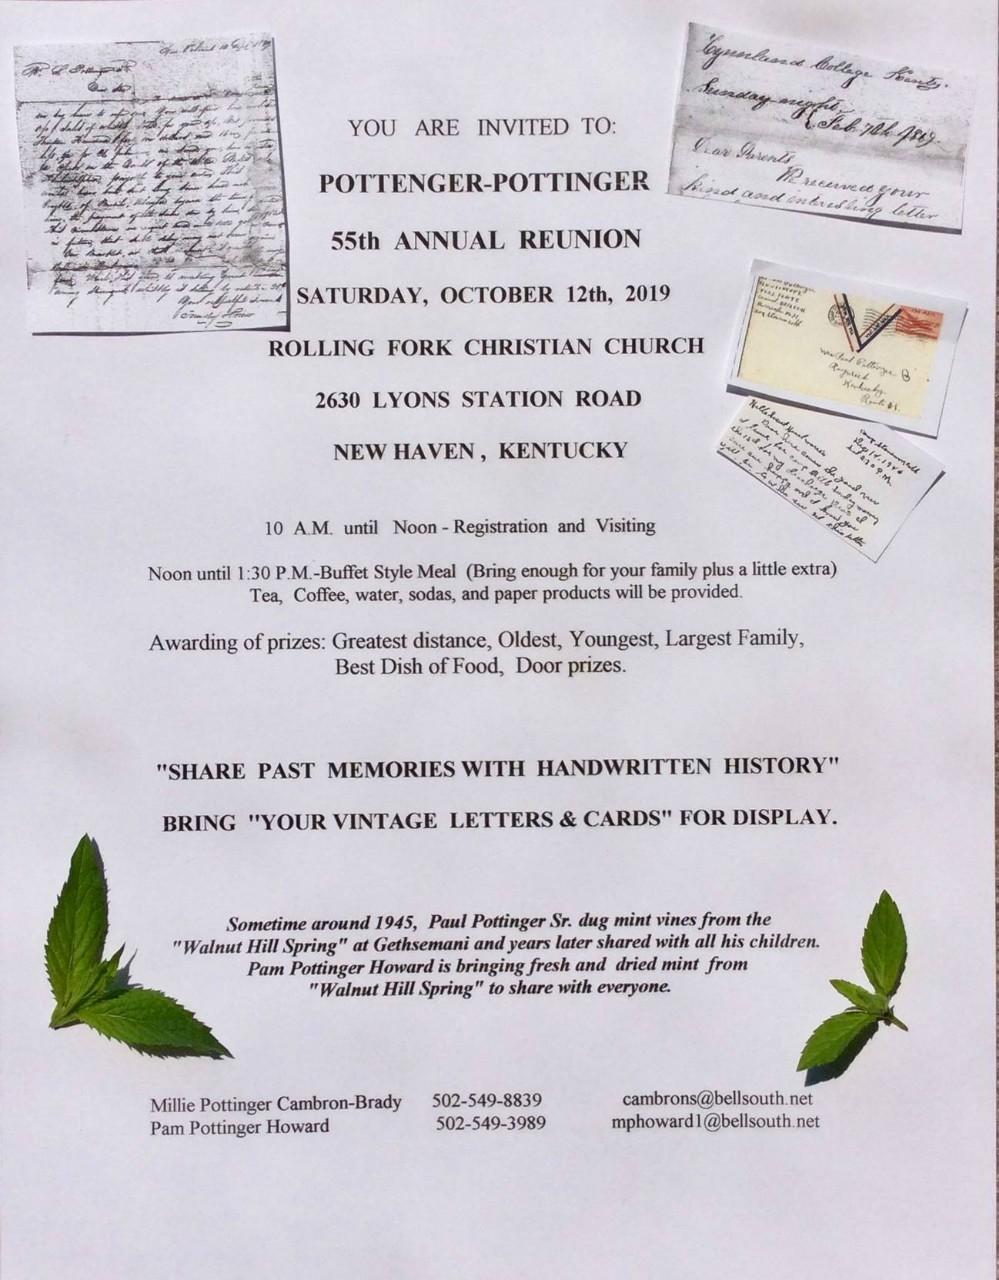 Pottenger-Pottinger 55th Reunion, October 12, 2019